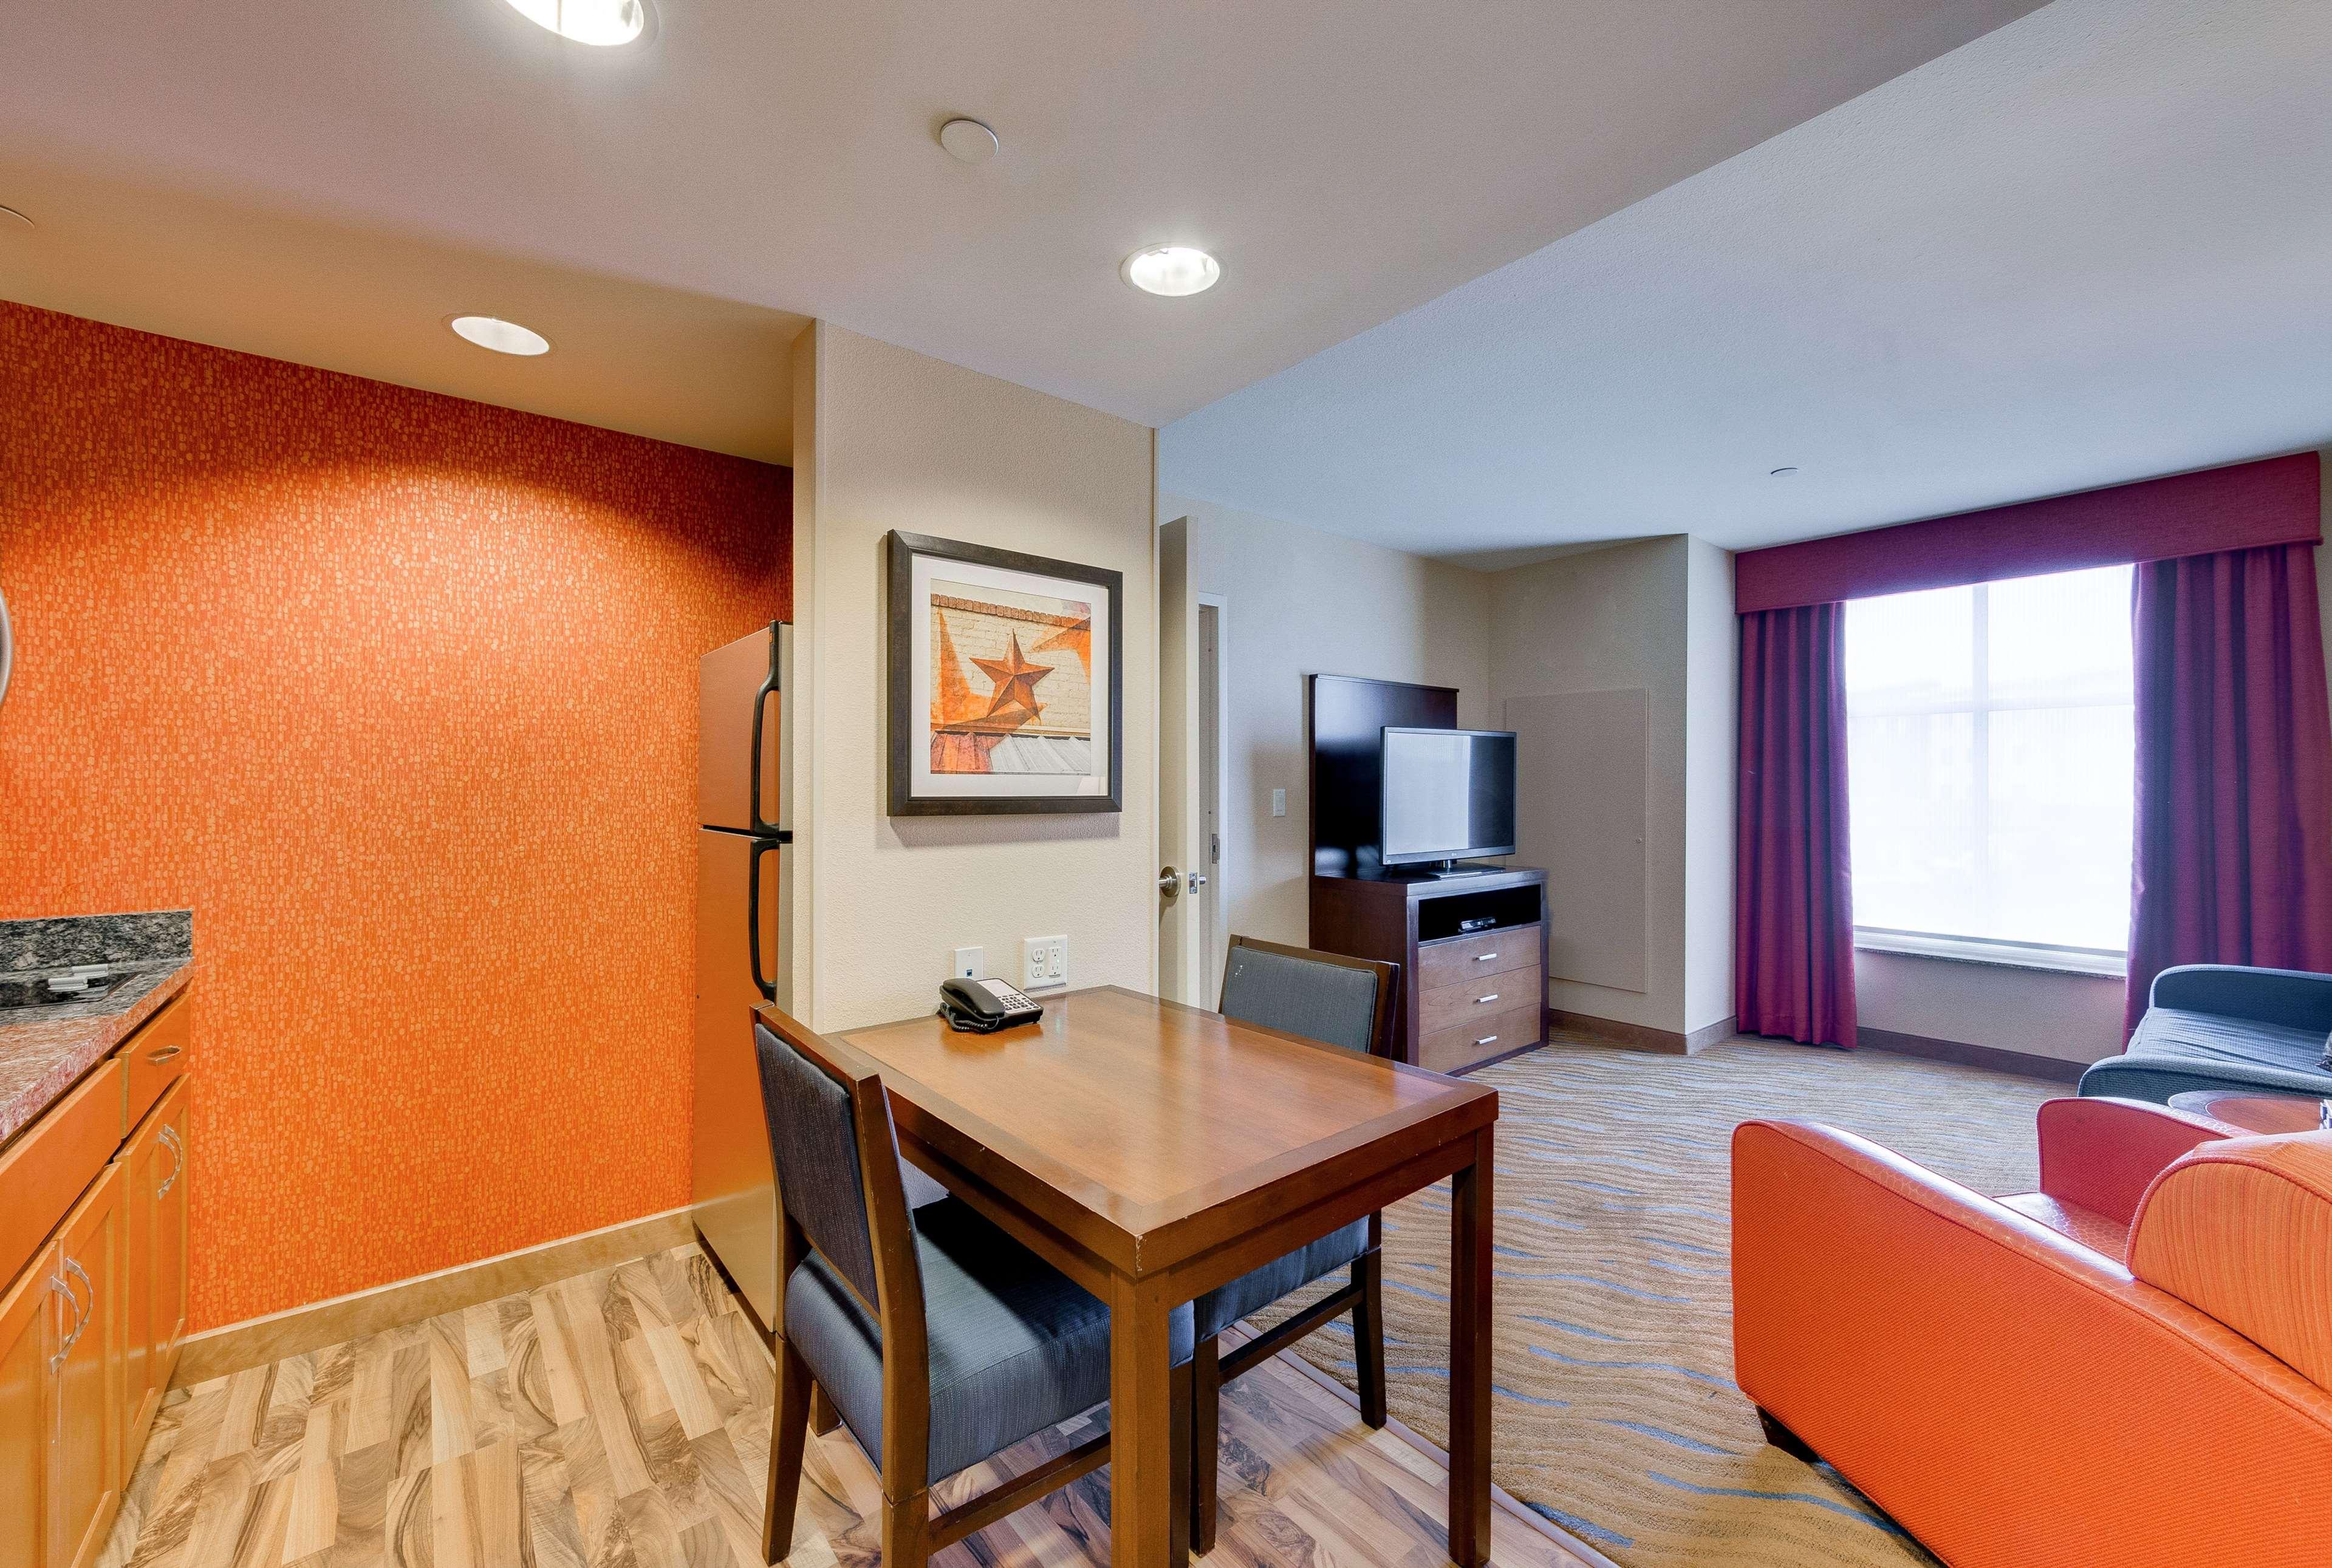 Homewood Suites by Hilton Fort Worth - Medical Center, TX image 16